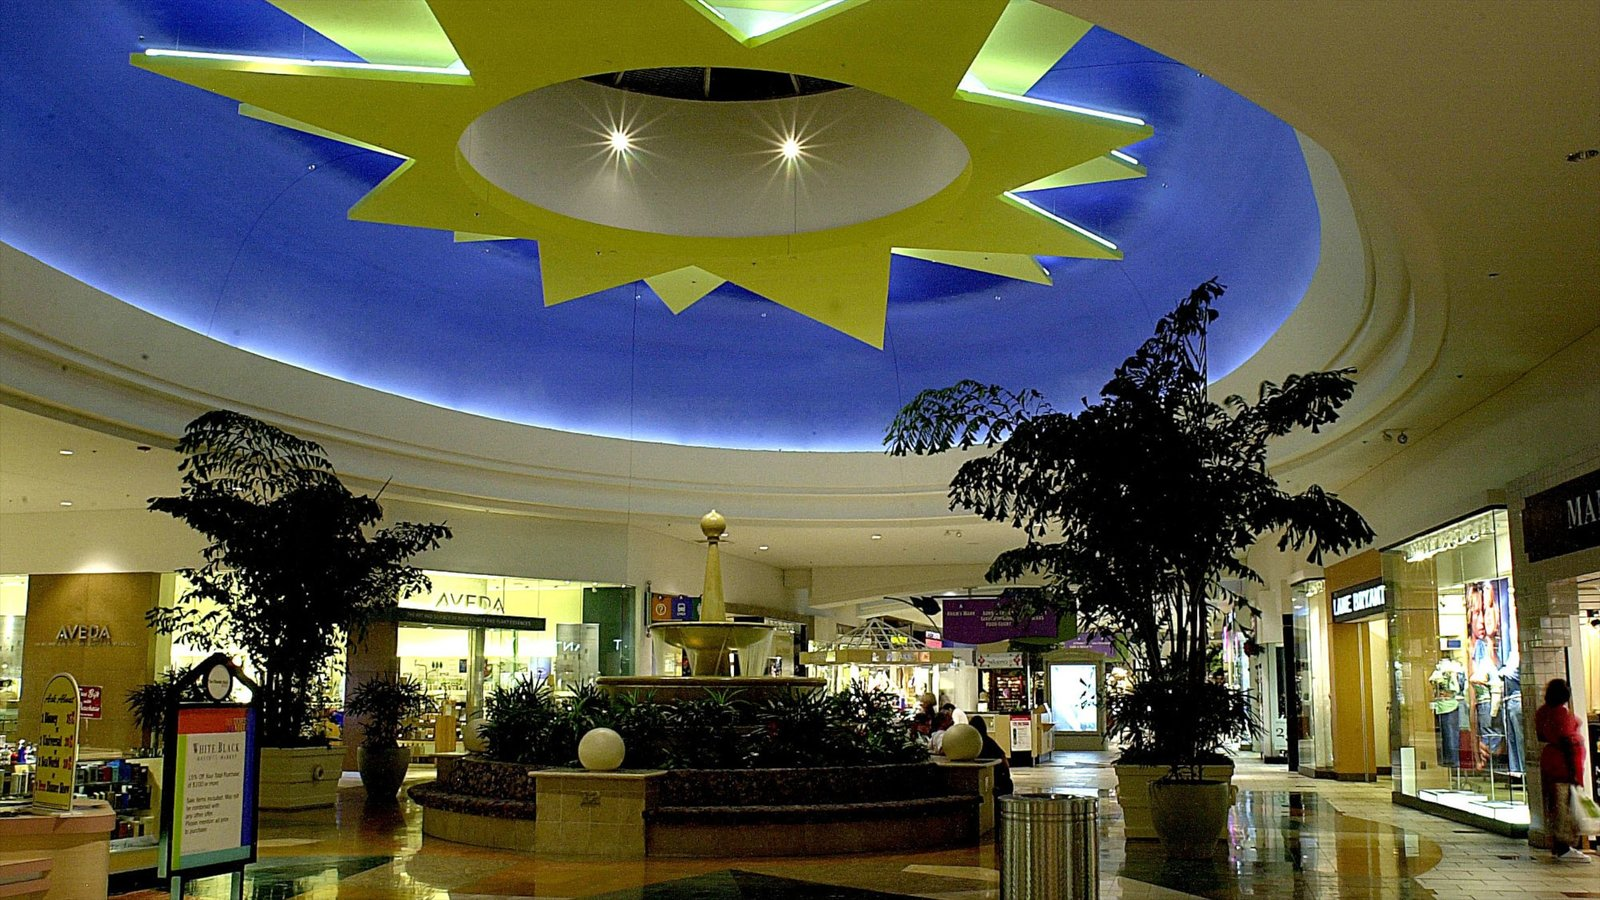 Florida Mall showing shopping and interior views